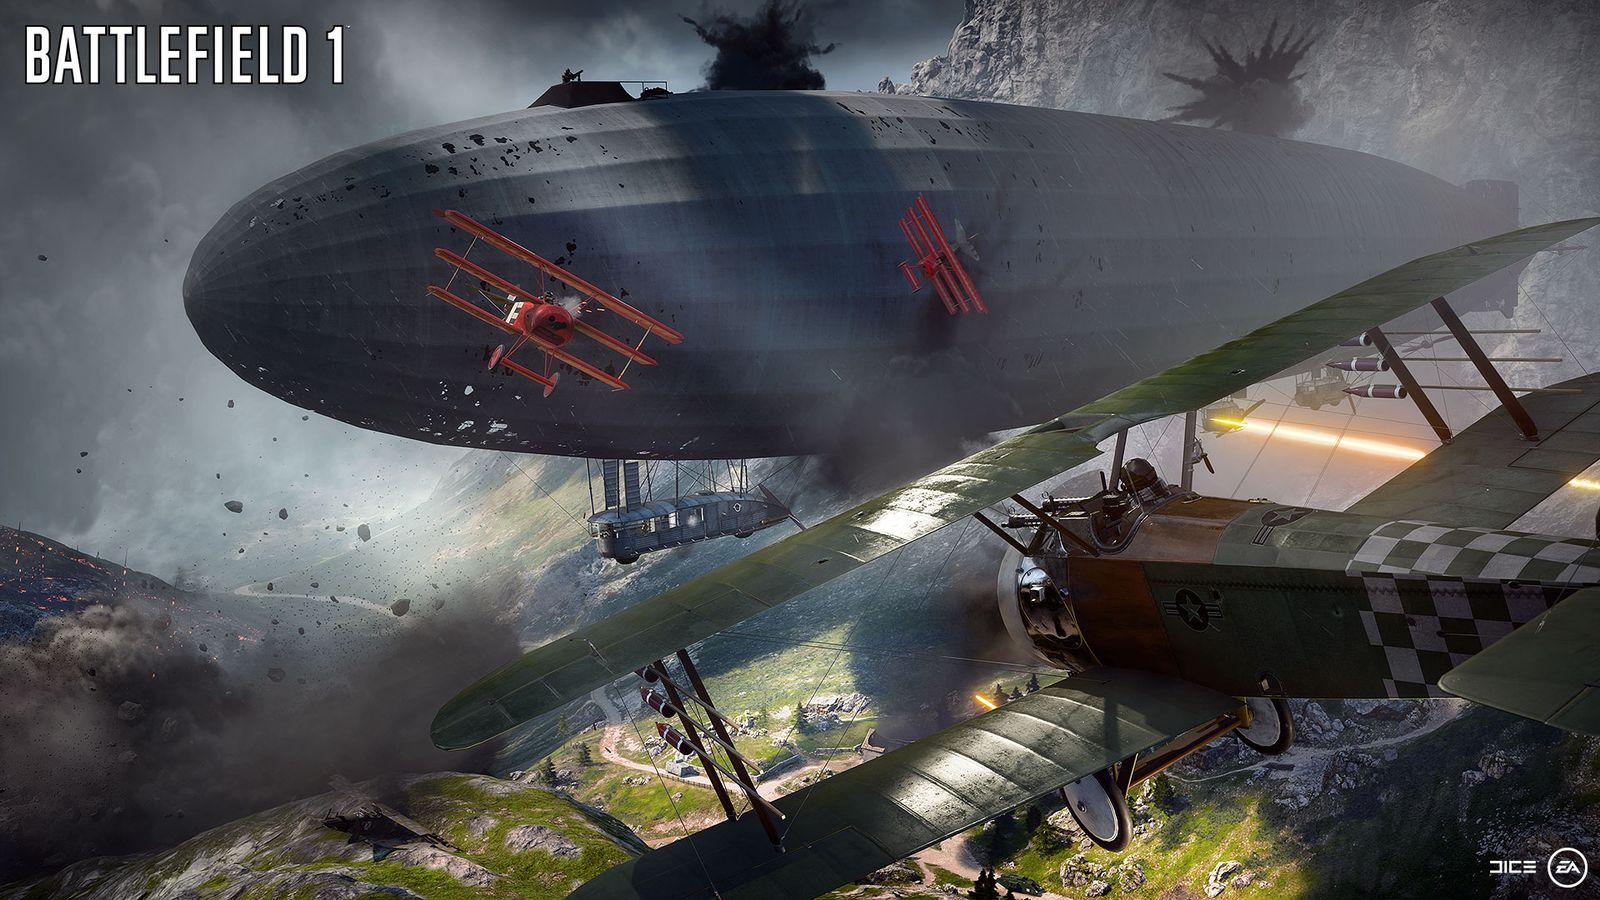 Spielemesse E3 / Battlefield 1